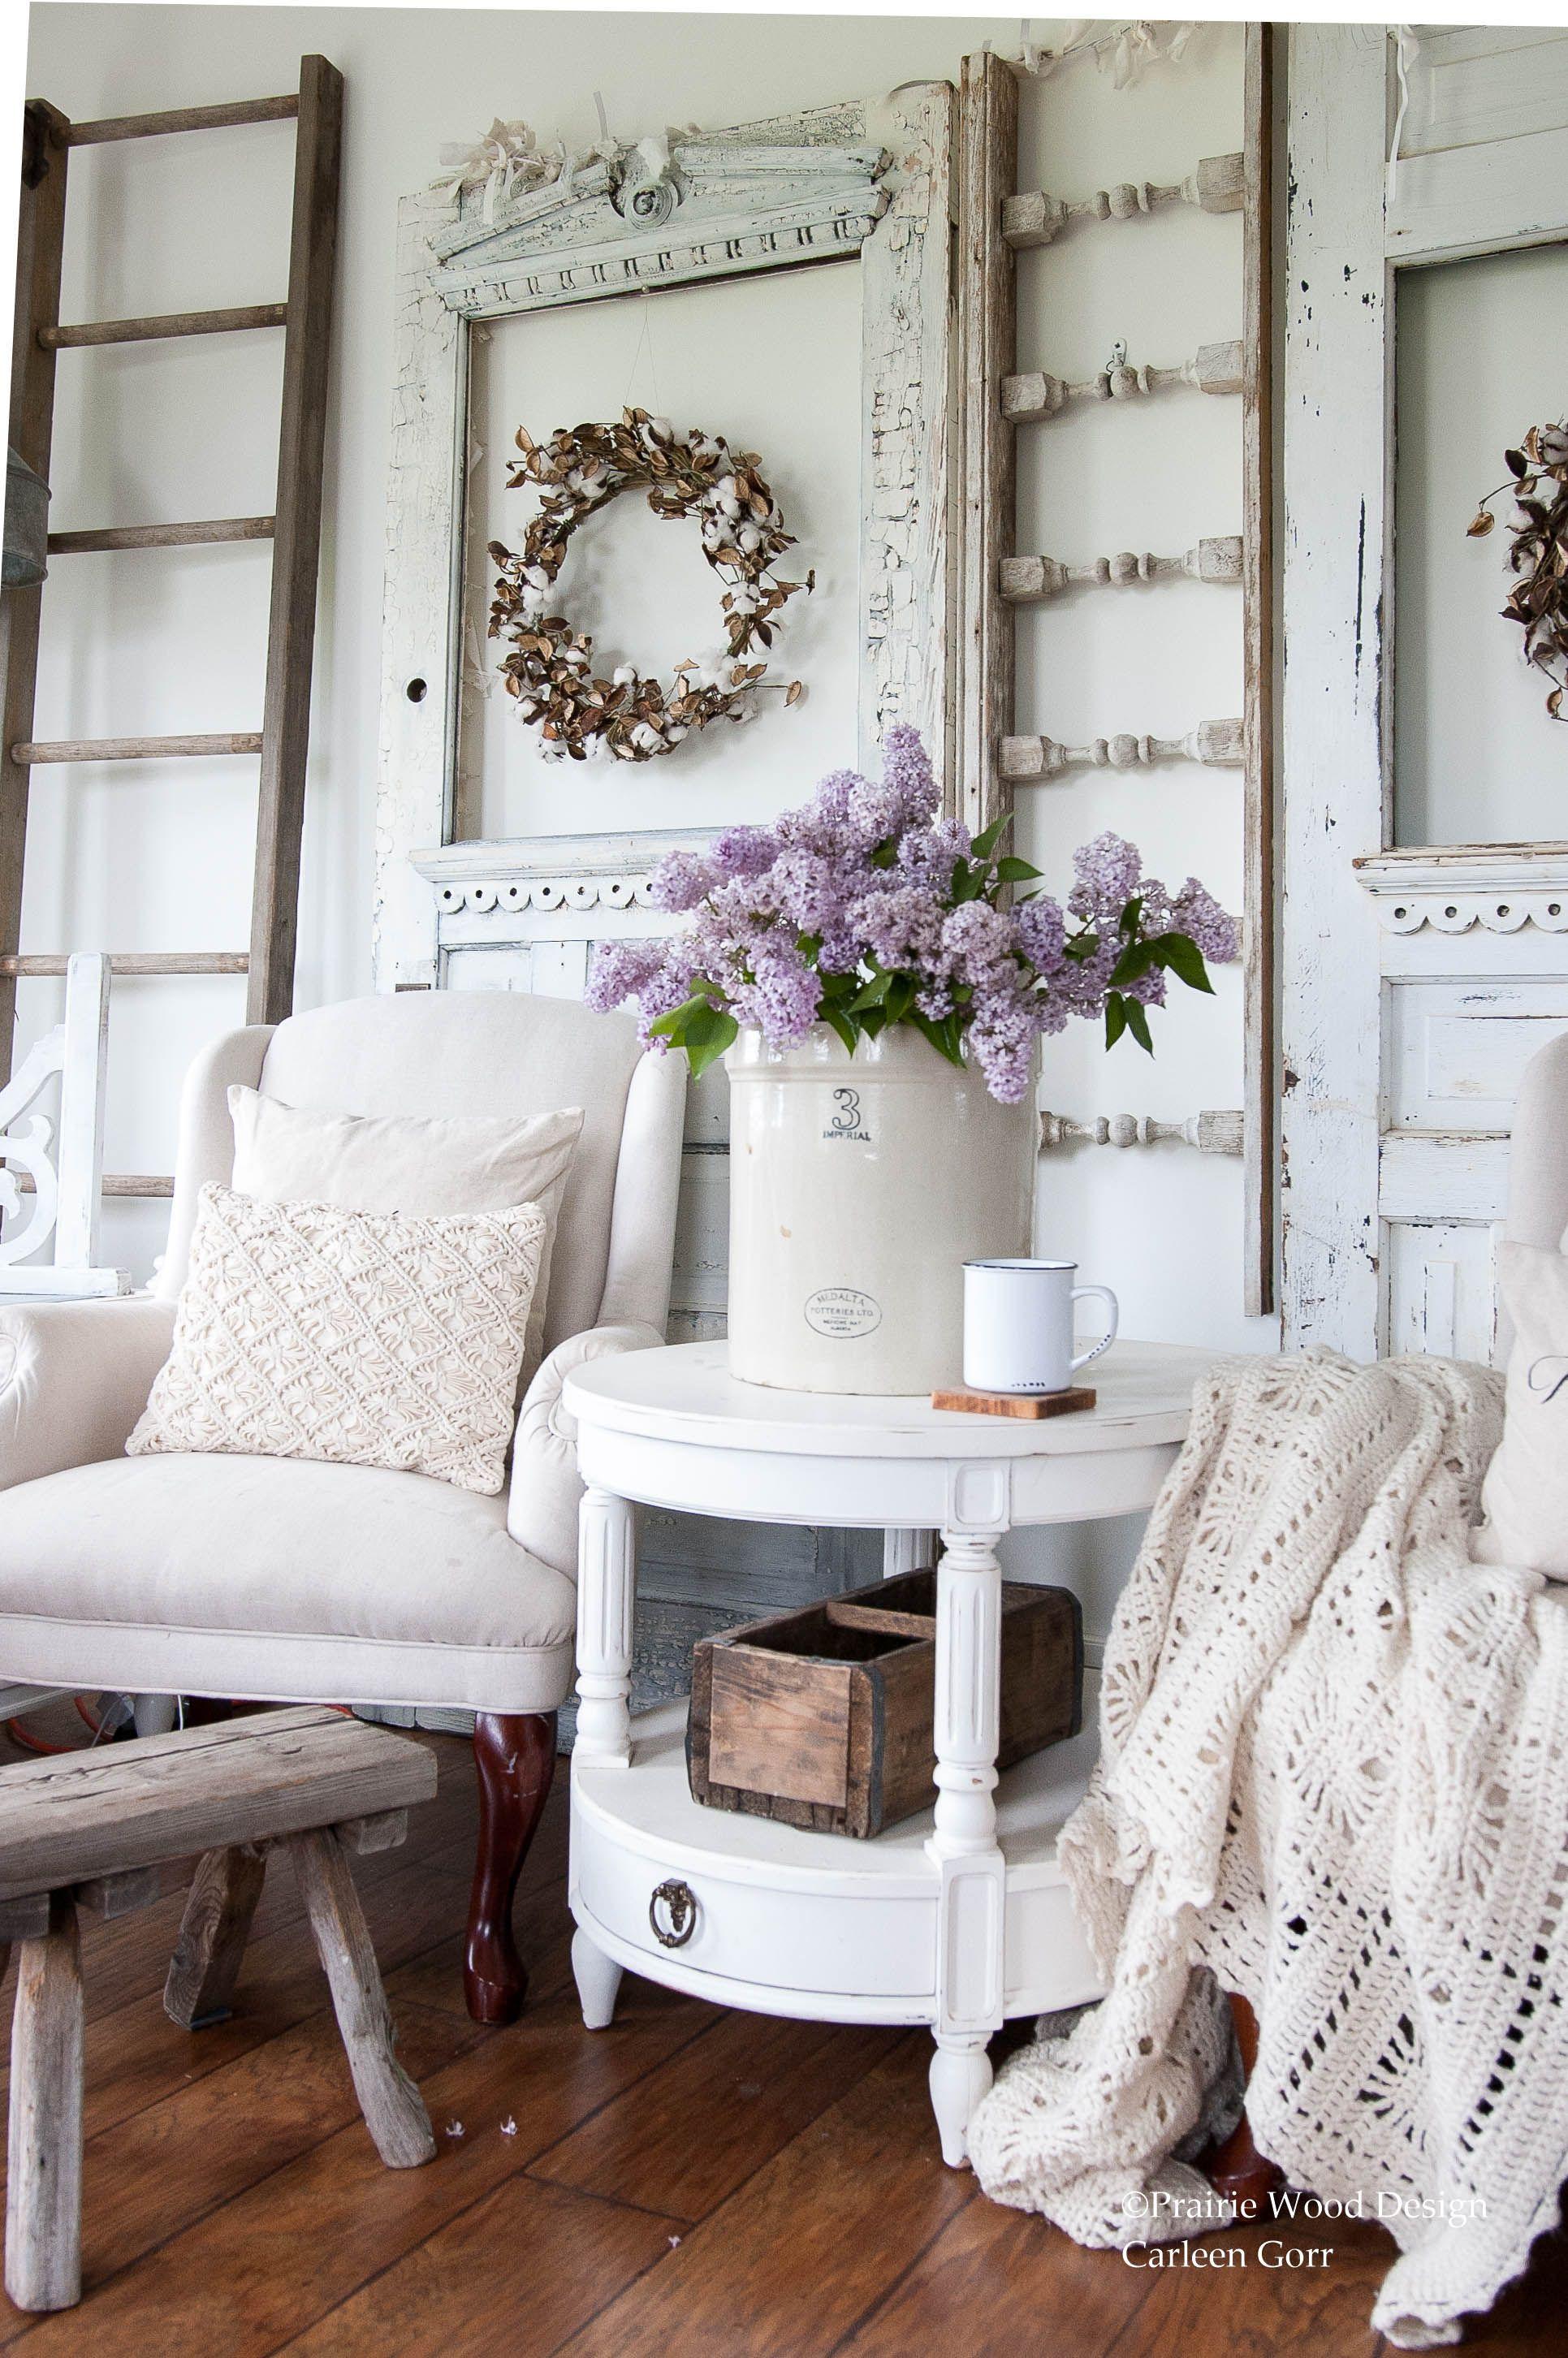 Prairie Wood Design Shabby Chic Decor Living Room Farmhouse Decor Living Room Shabby Chic Decor